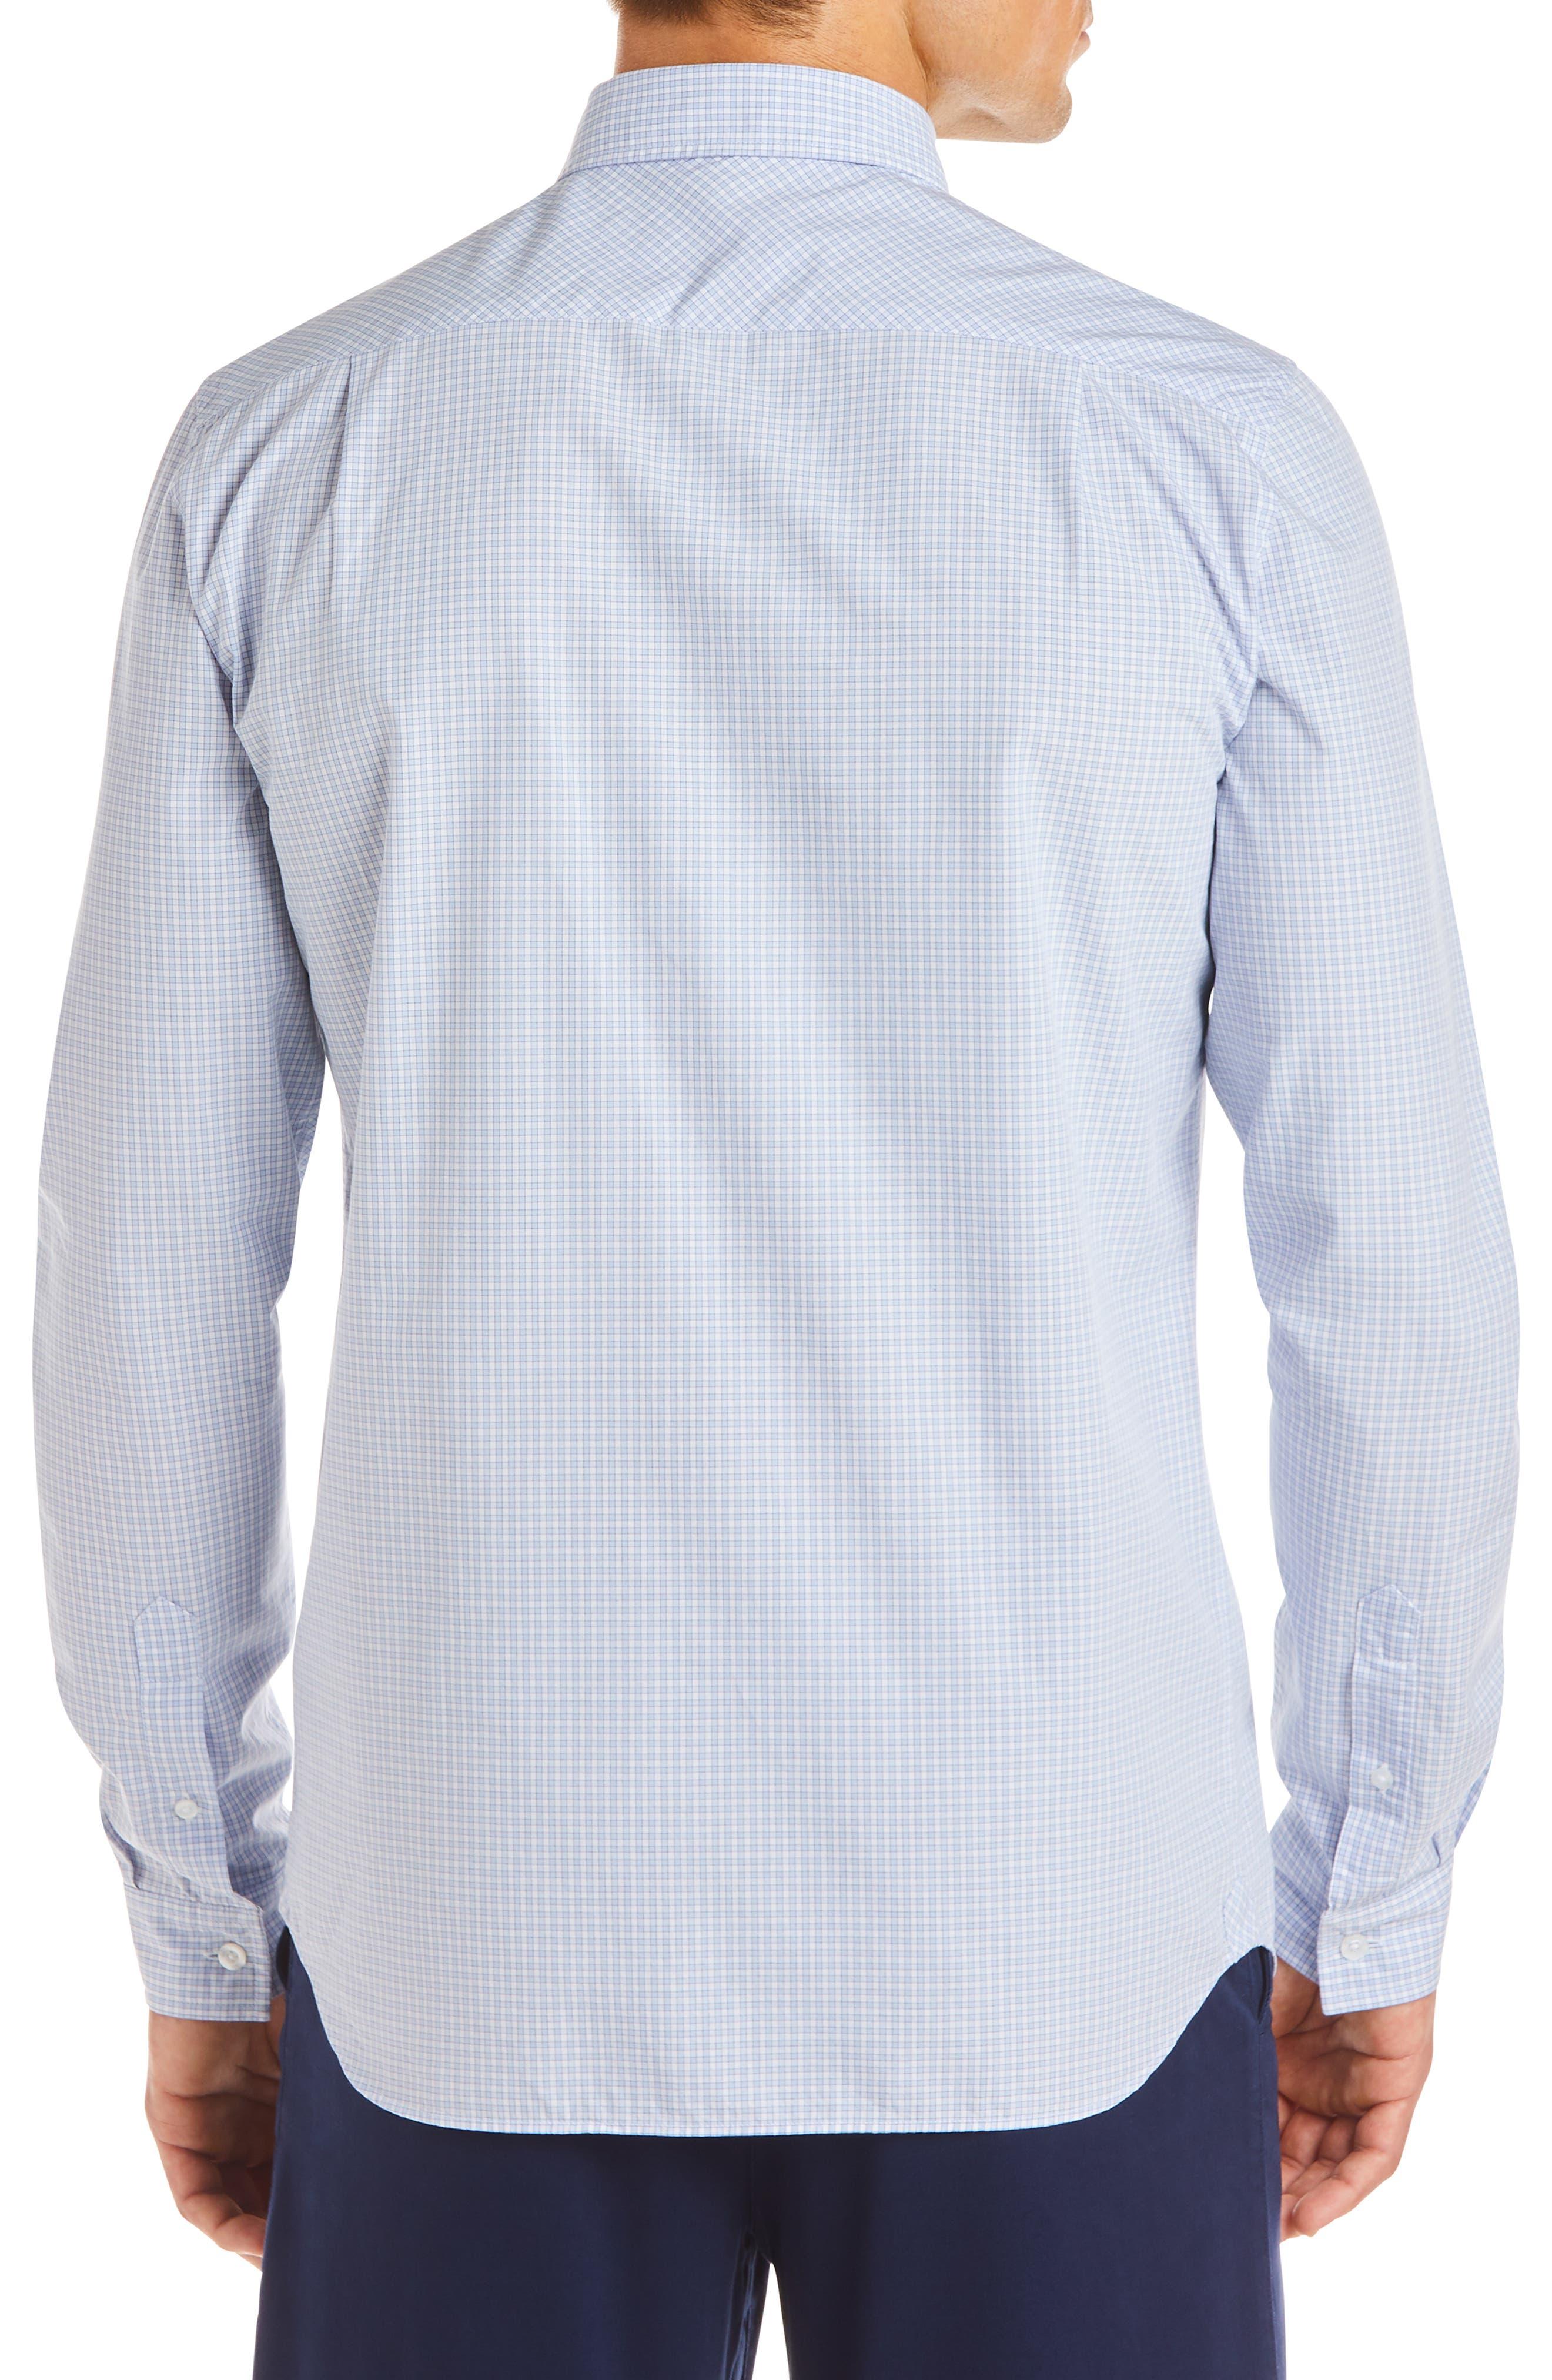 Regular Fit Check Sport Shirt,                             Alternate thumbnail 2, color,                             IODINE/ WHITE